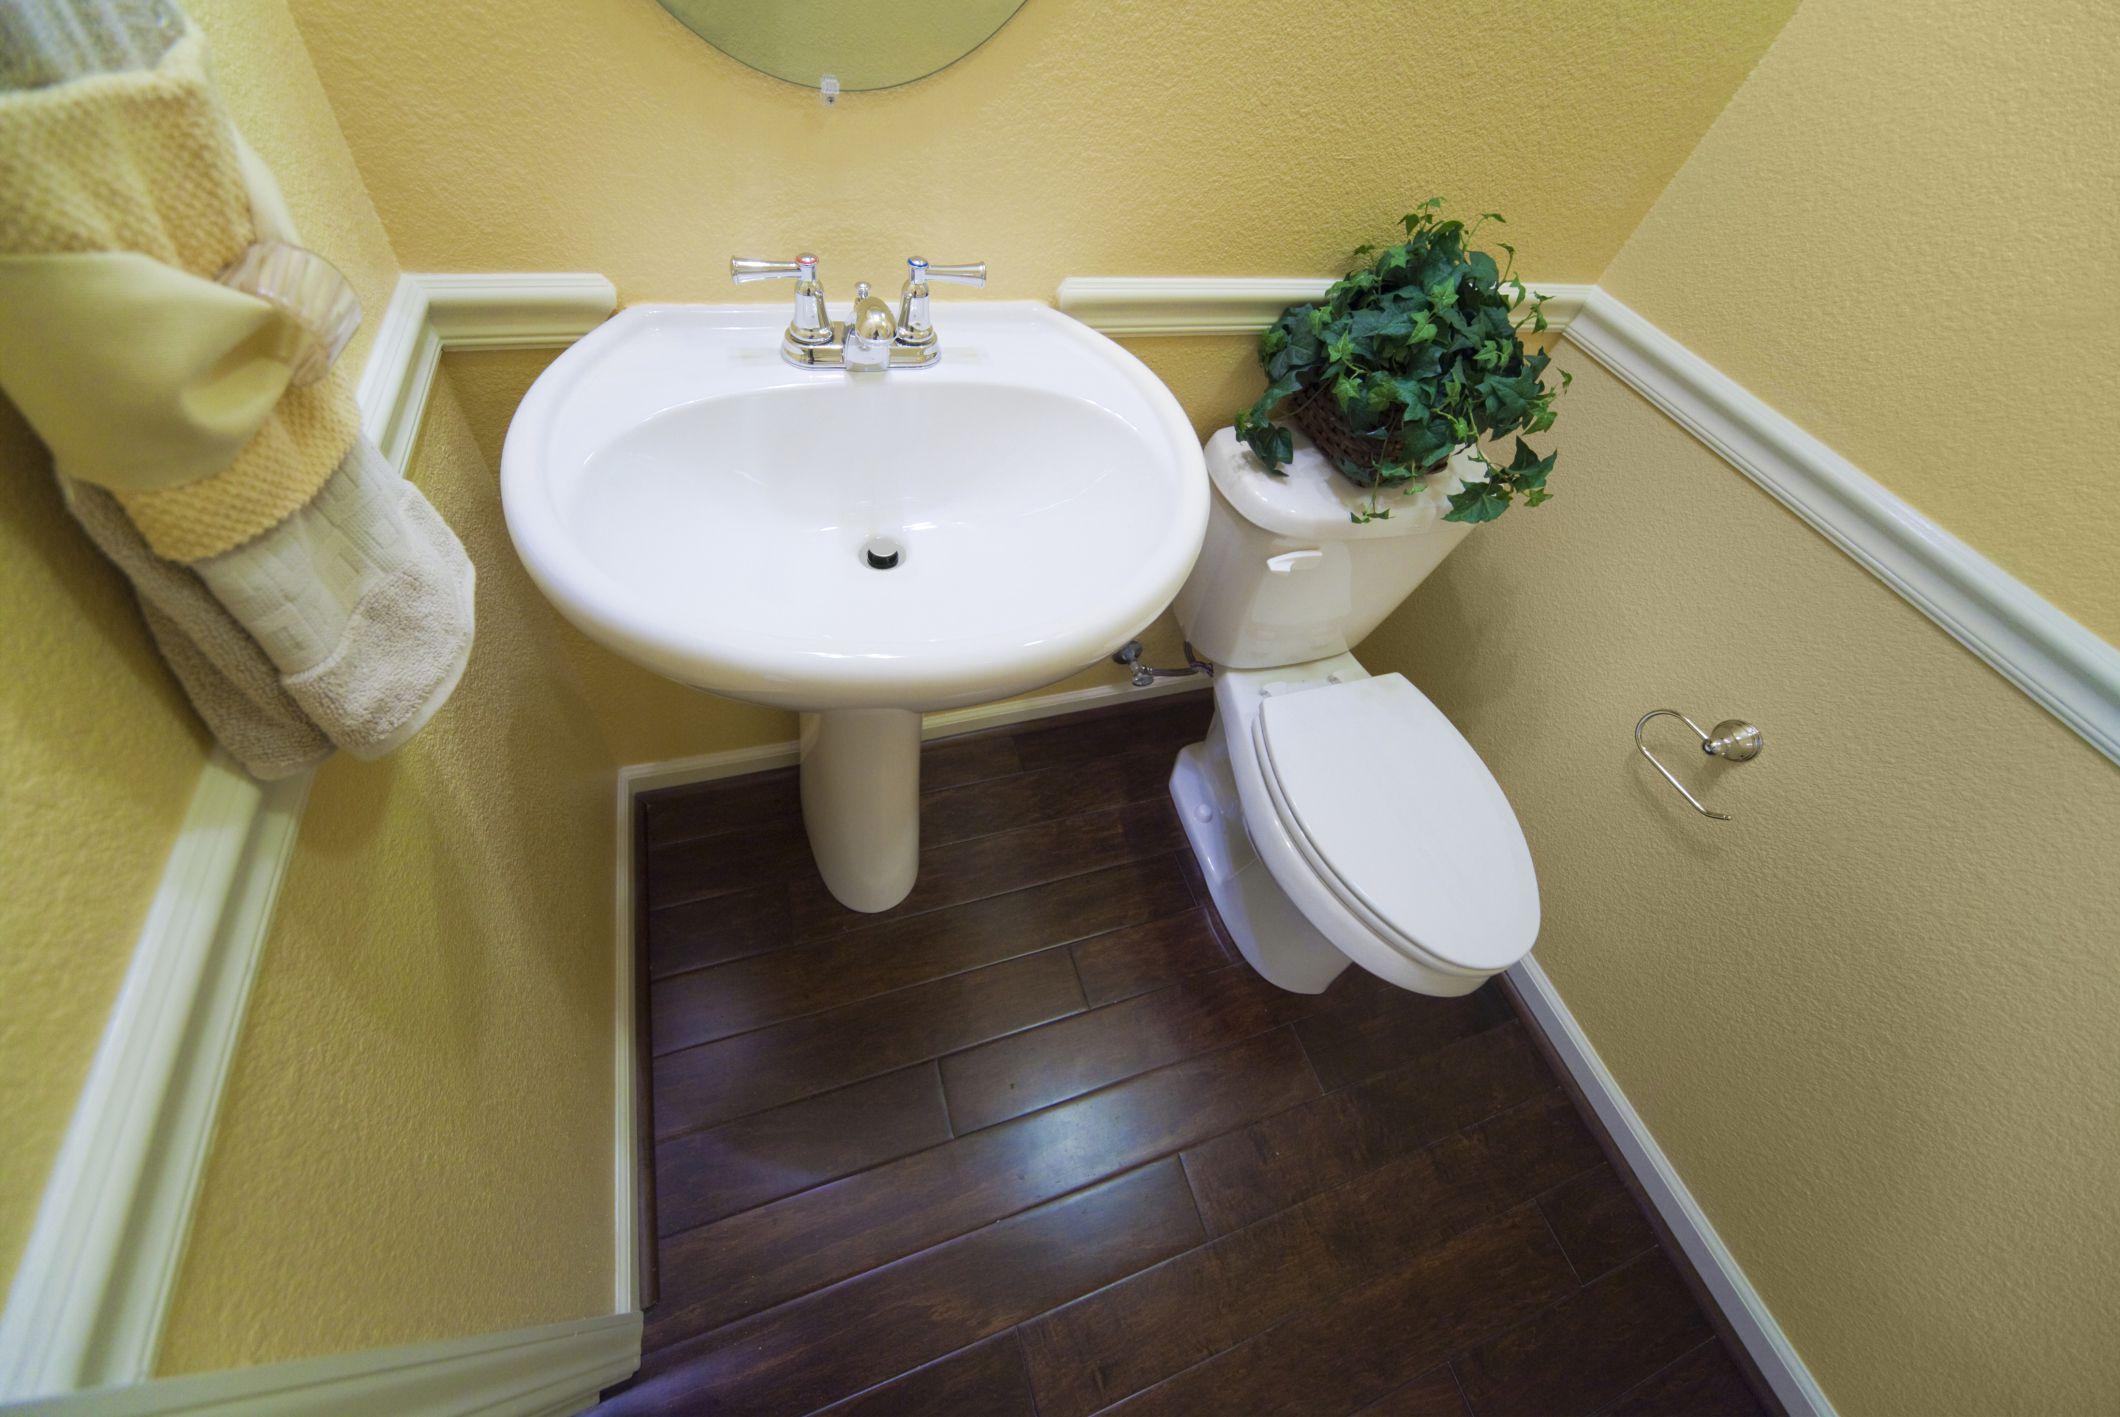 Half bath ideas how to make this tiny space shine - Make bathroom shine ...